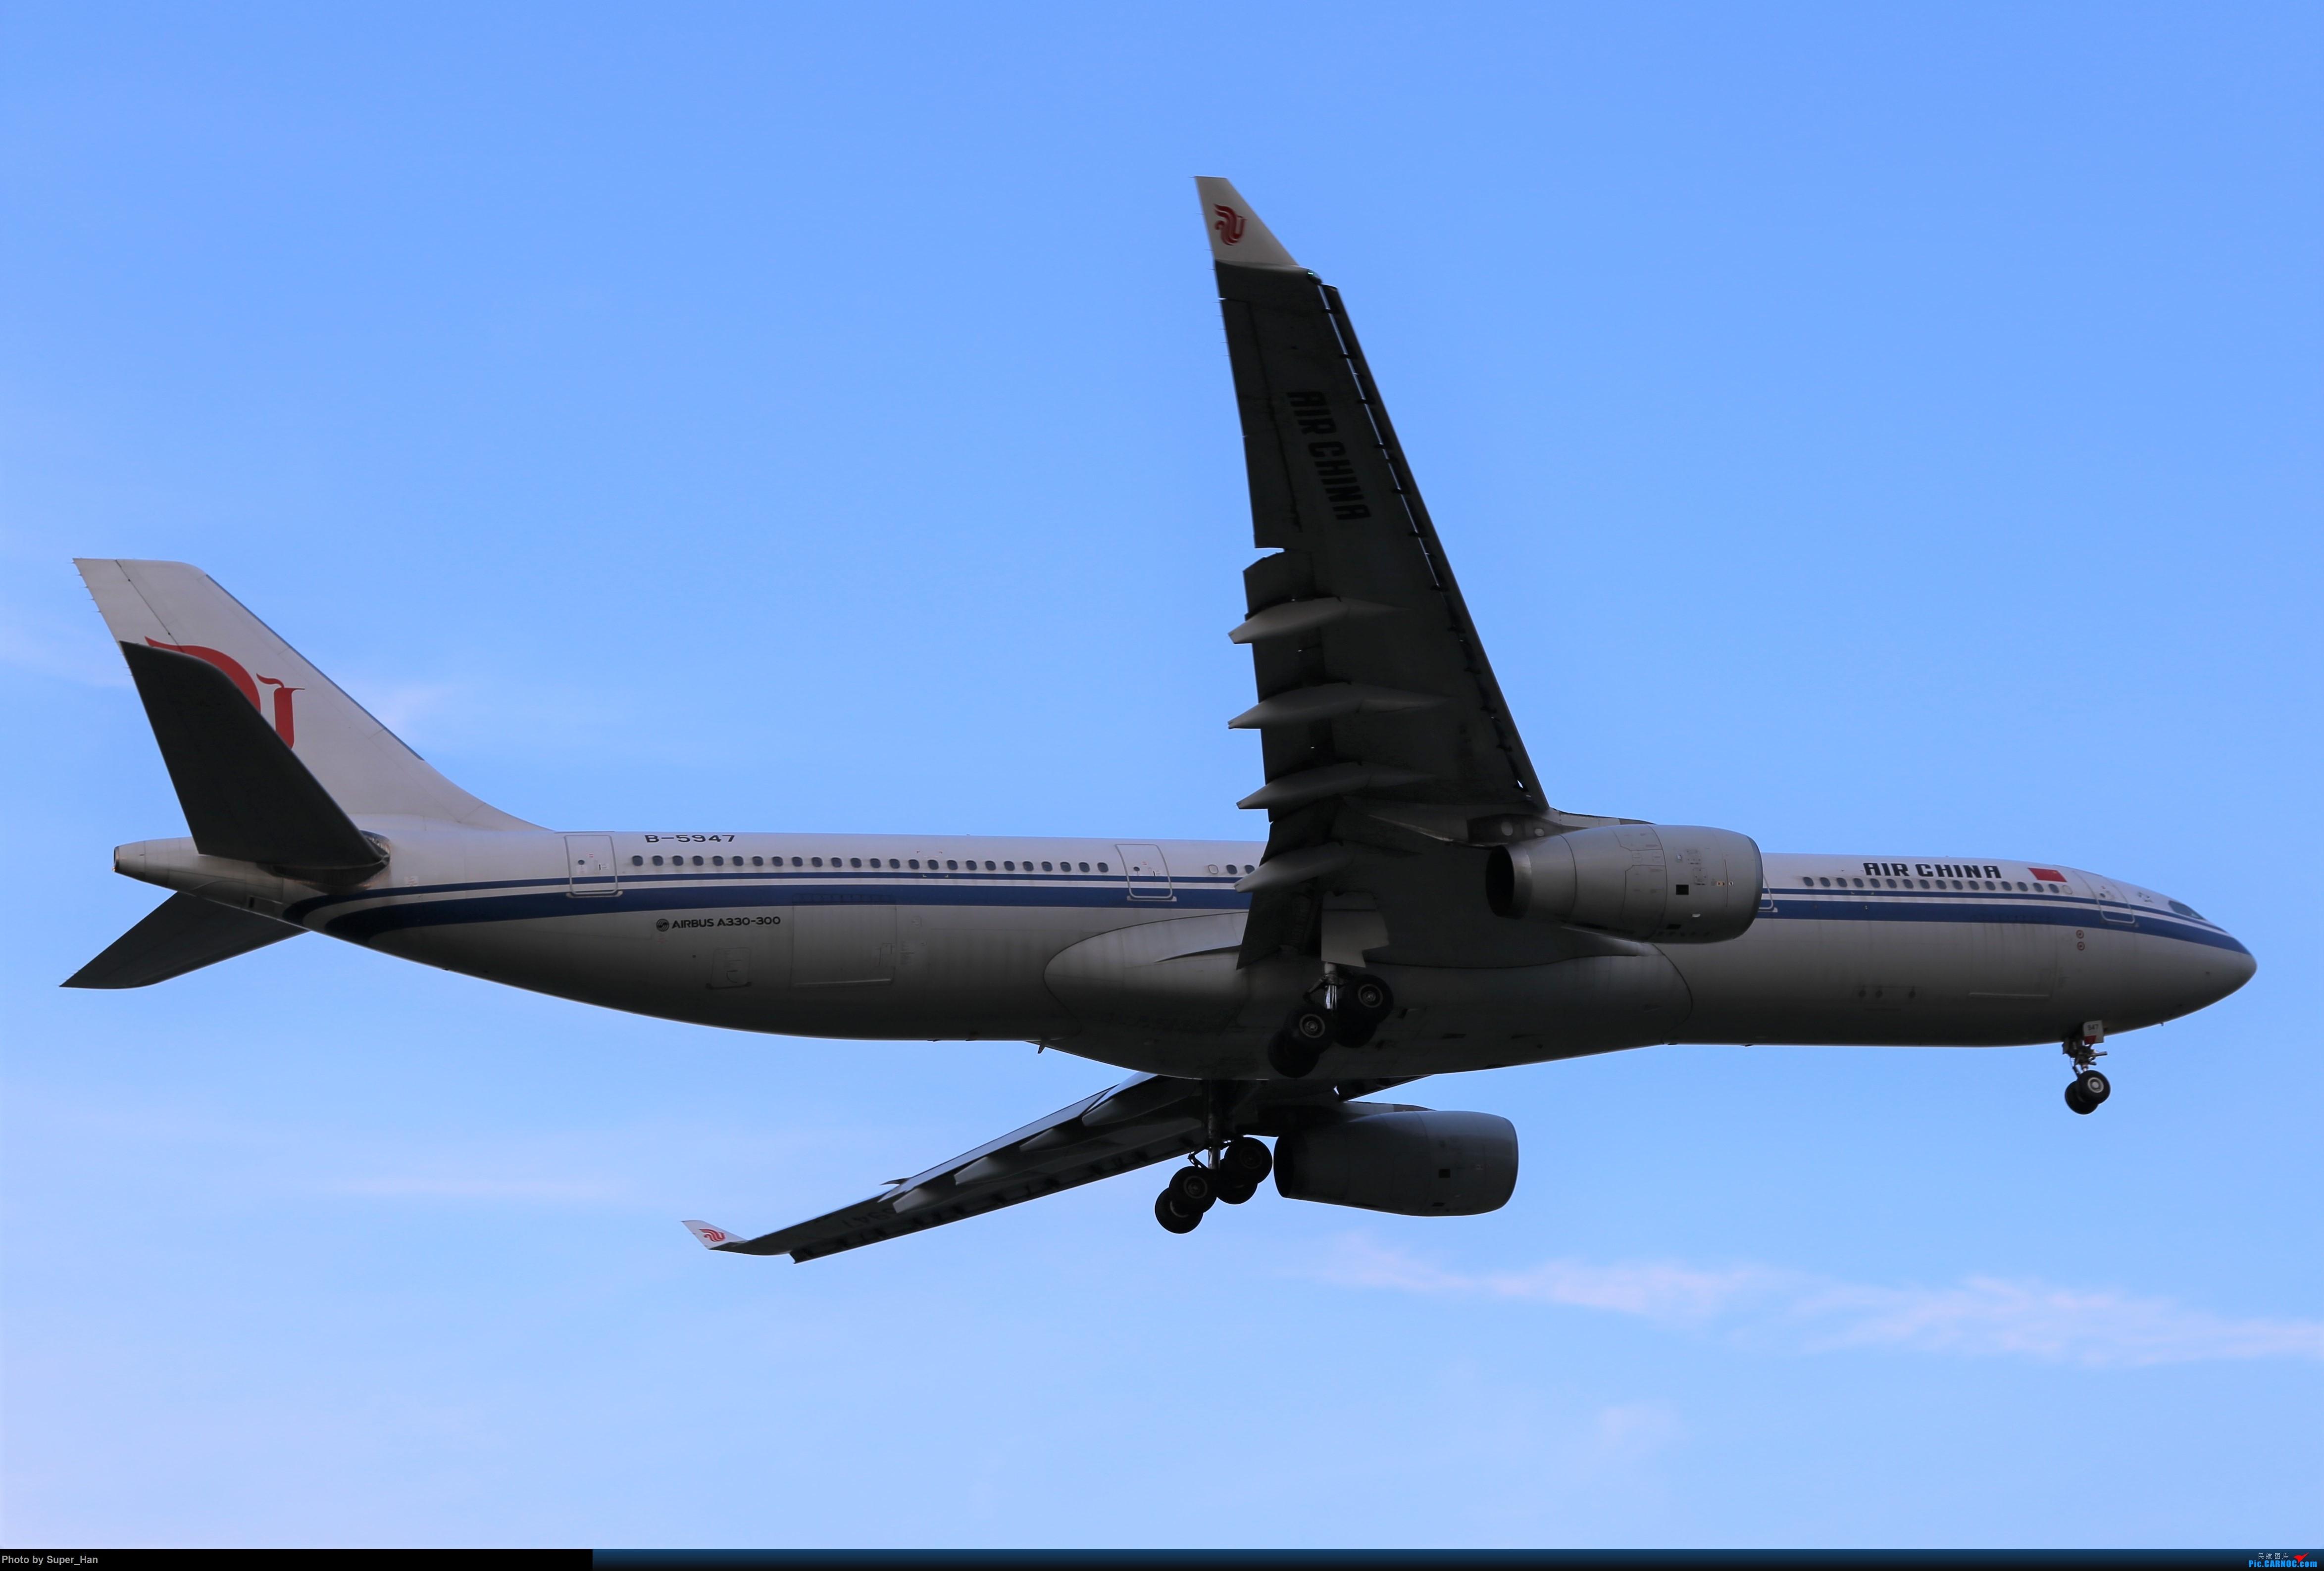 Re:[原创]0715去虹桥说走就走【最多的330篇】 AIRBUS A330-300 B-5947 中国上海虹桥国际机场